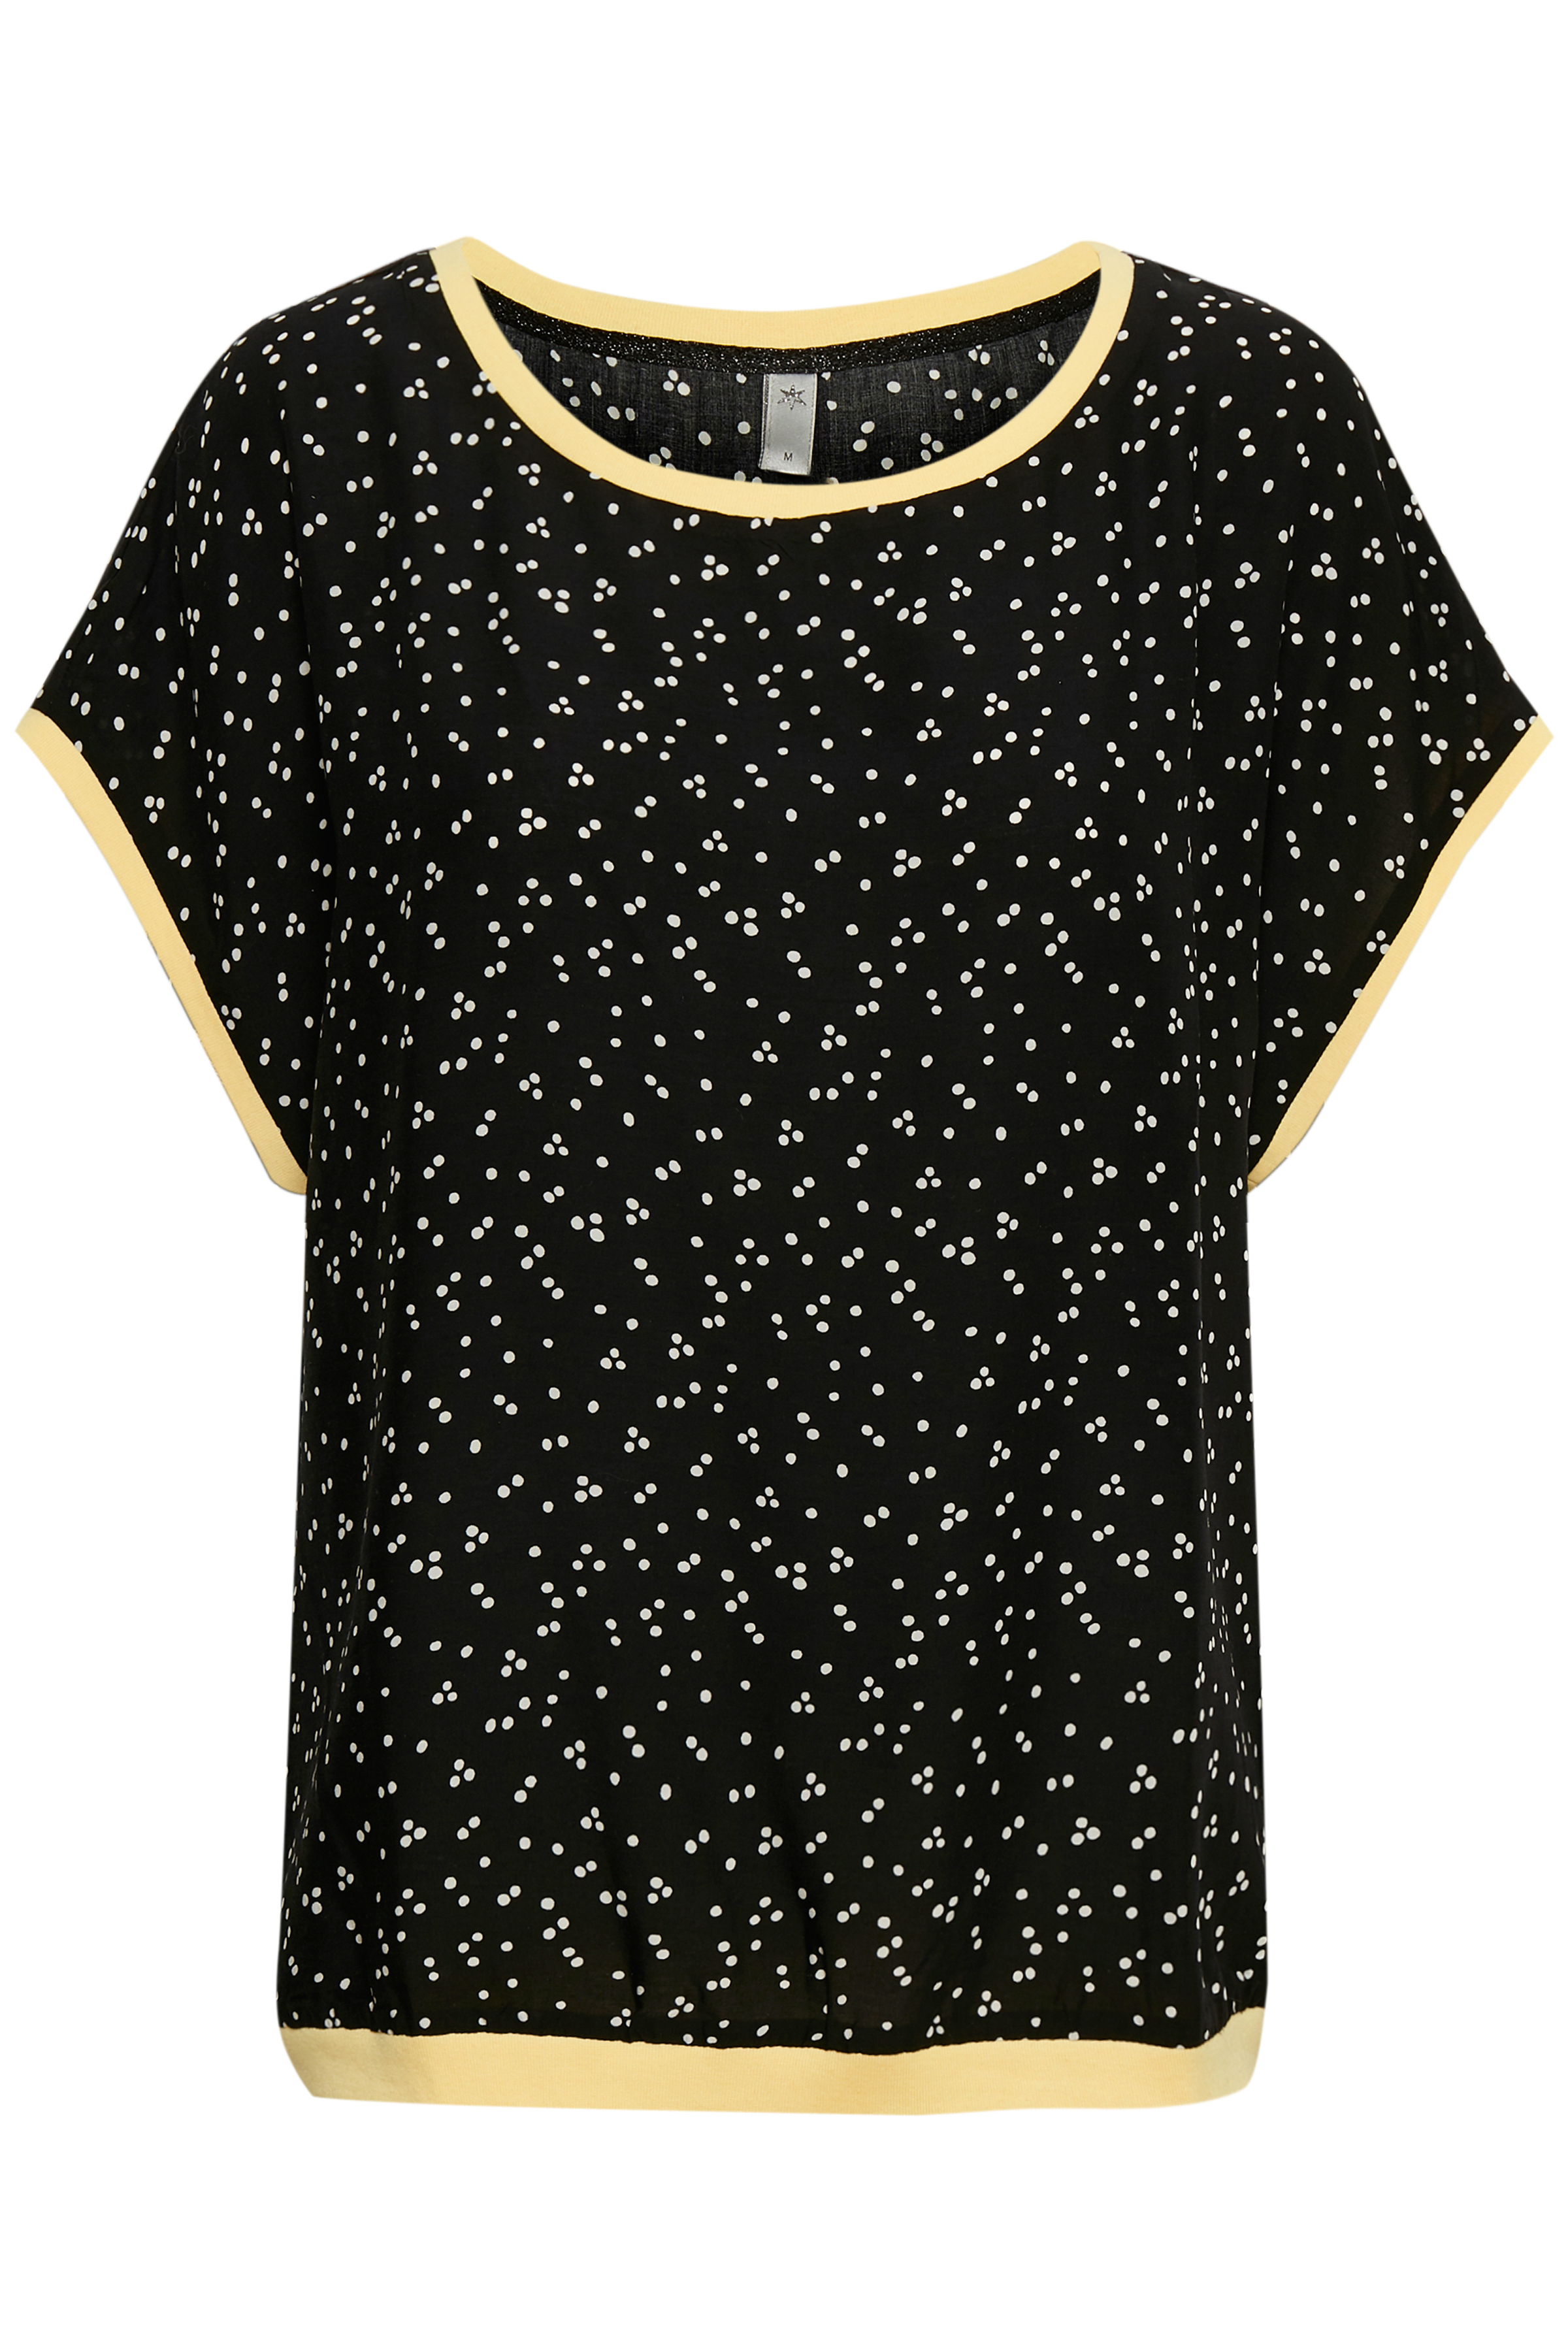 Culture Dame T-shirt korte mouw - Zwart/wit